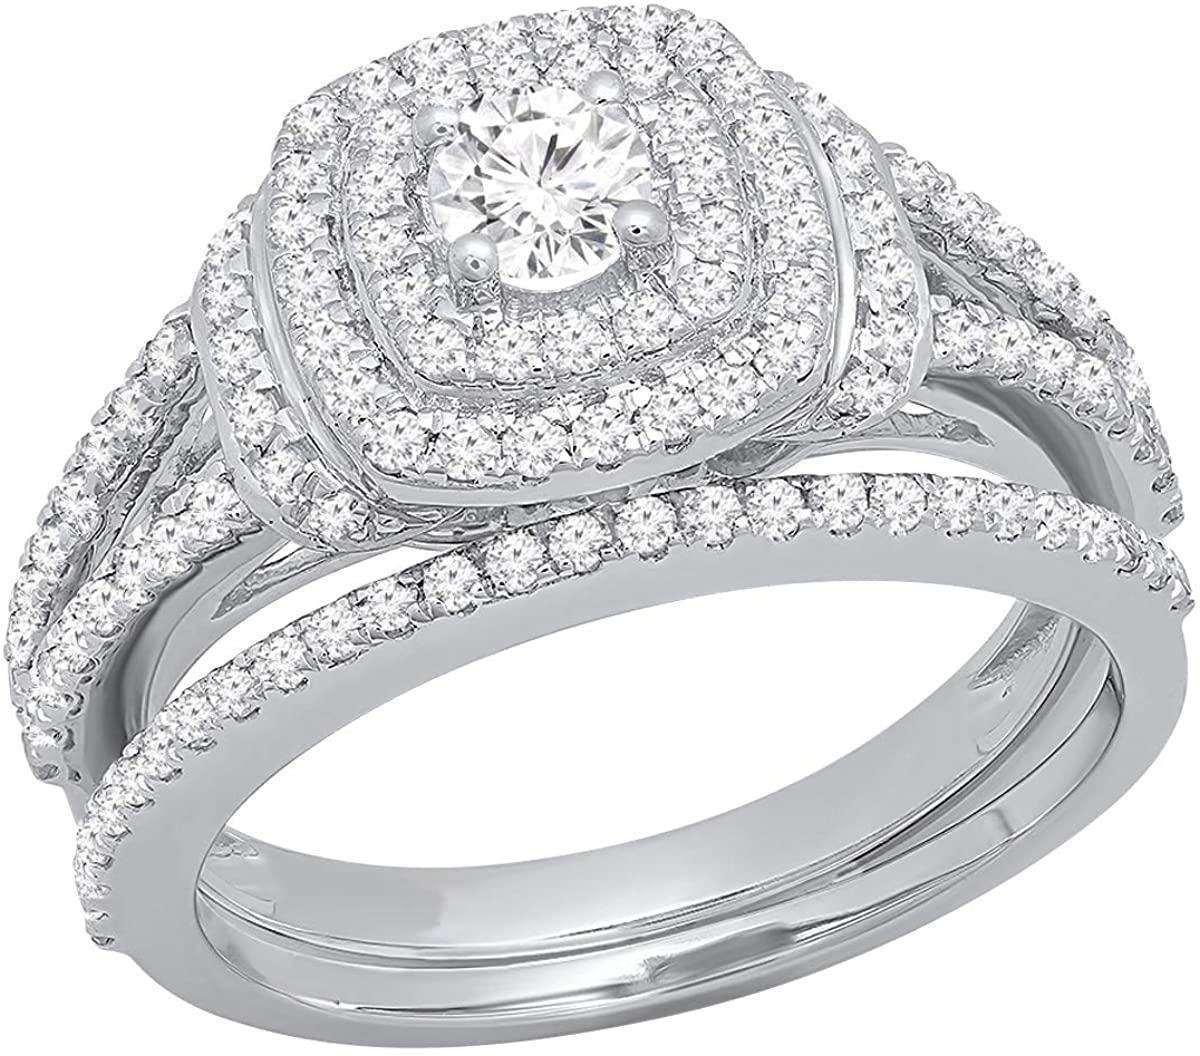 Dazzlingrock Collection 1.00 Carat (Ctw) 14K Gold Round Diamond Ladies Bridal Halo Engagement Ring with Matching Band Set 1 CT